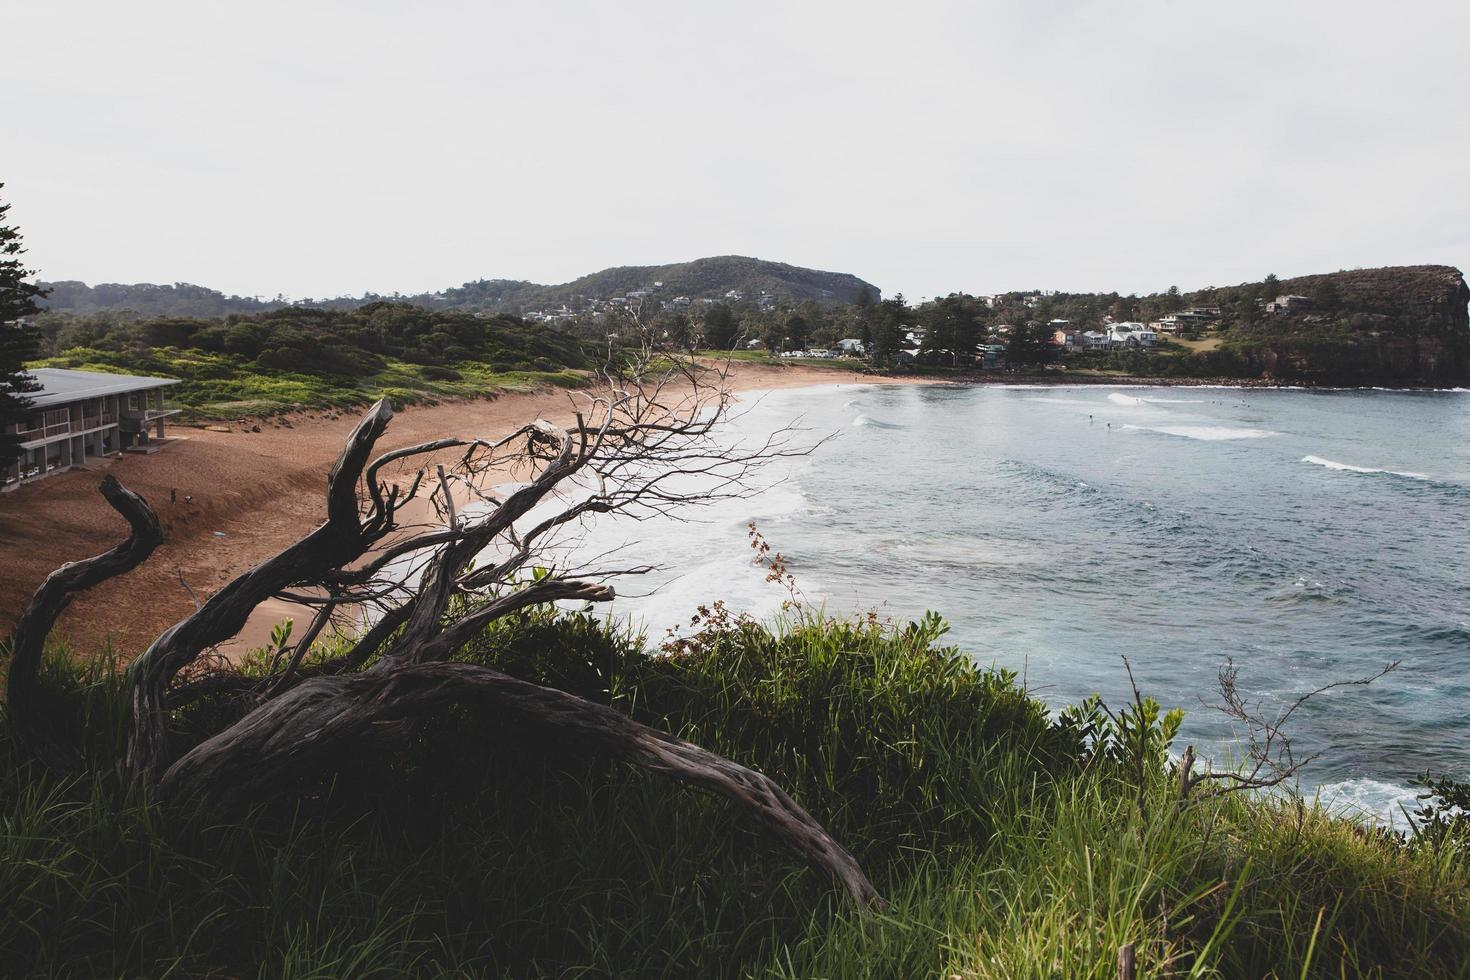 Sydney, Australia, 2020 - Overcast day at the beach photo